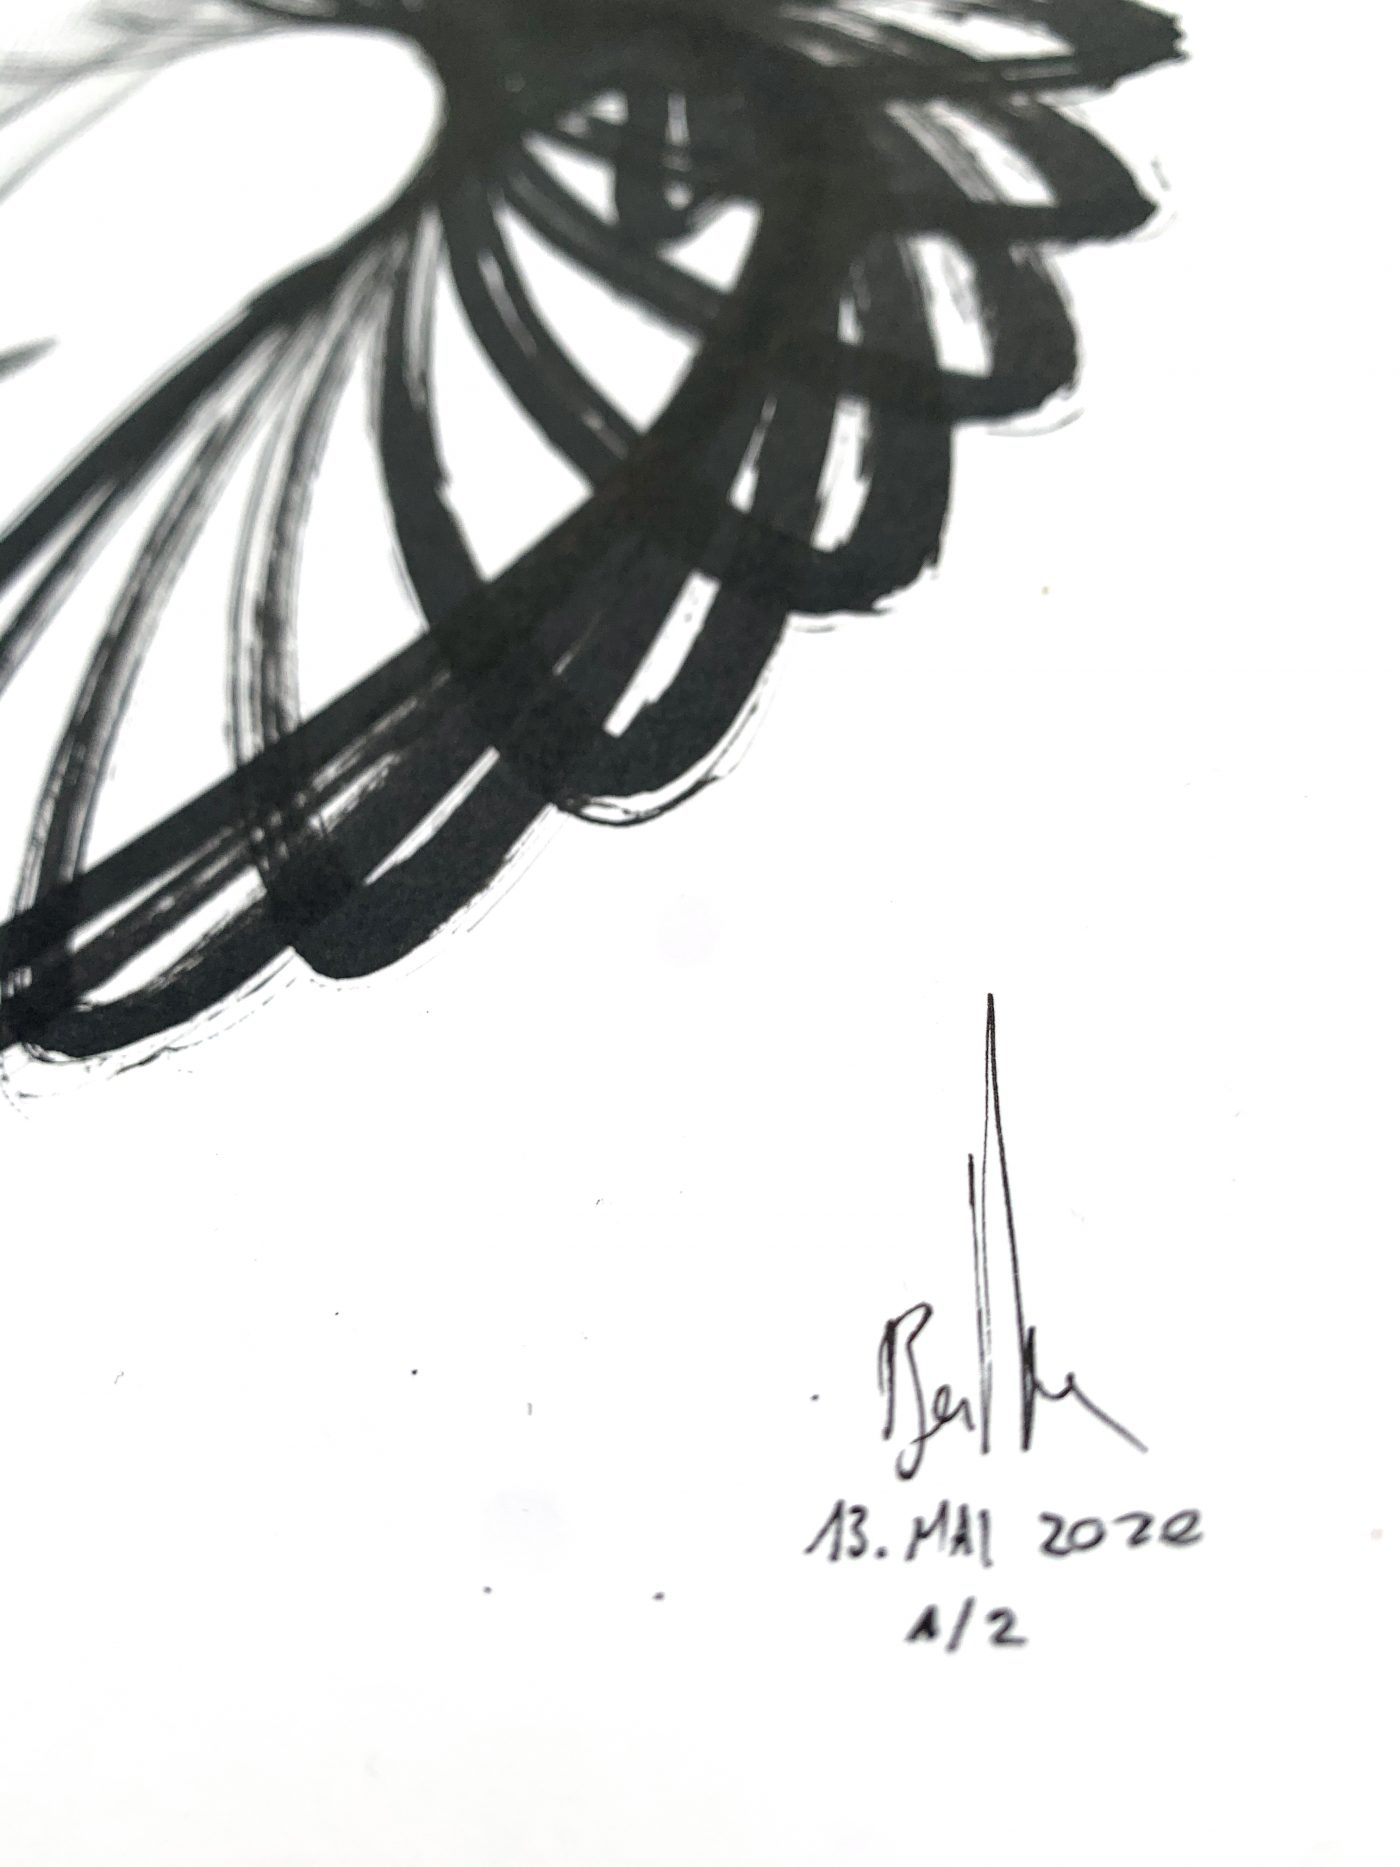 x134-2 - 13 Mai